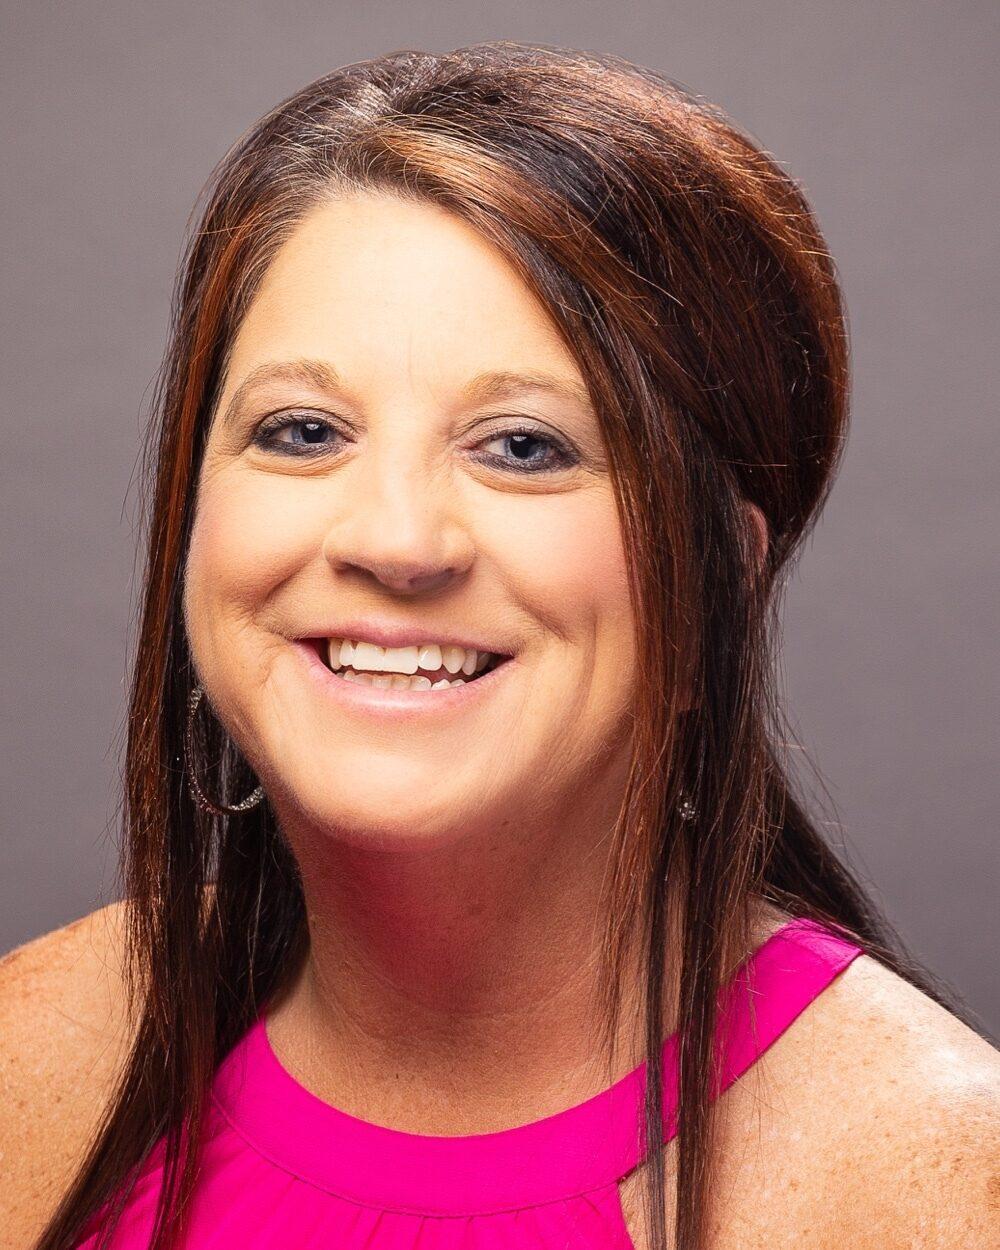 Jennifer smith 2019 staff team